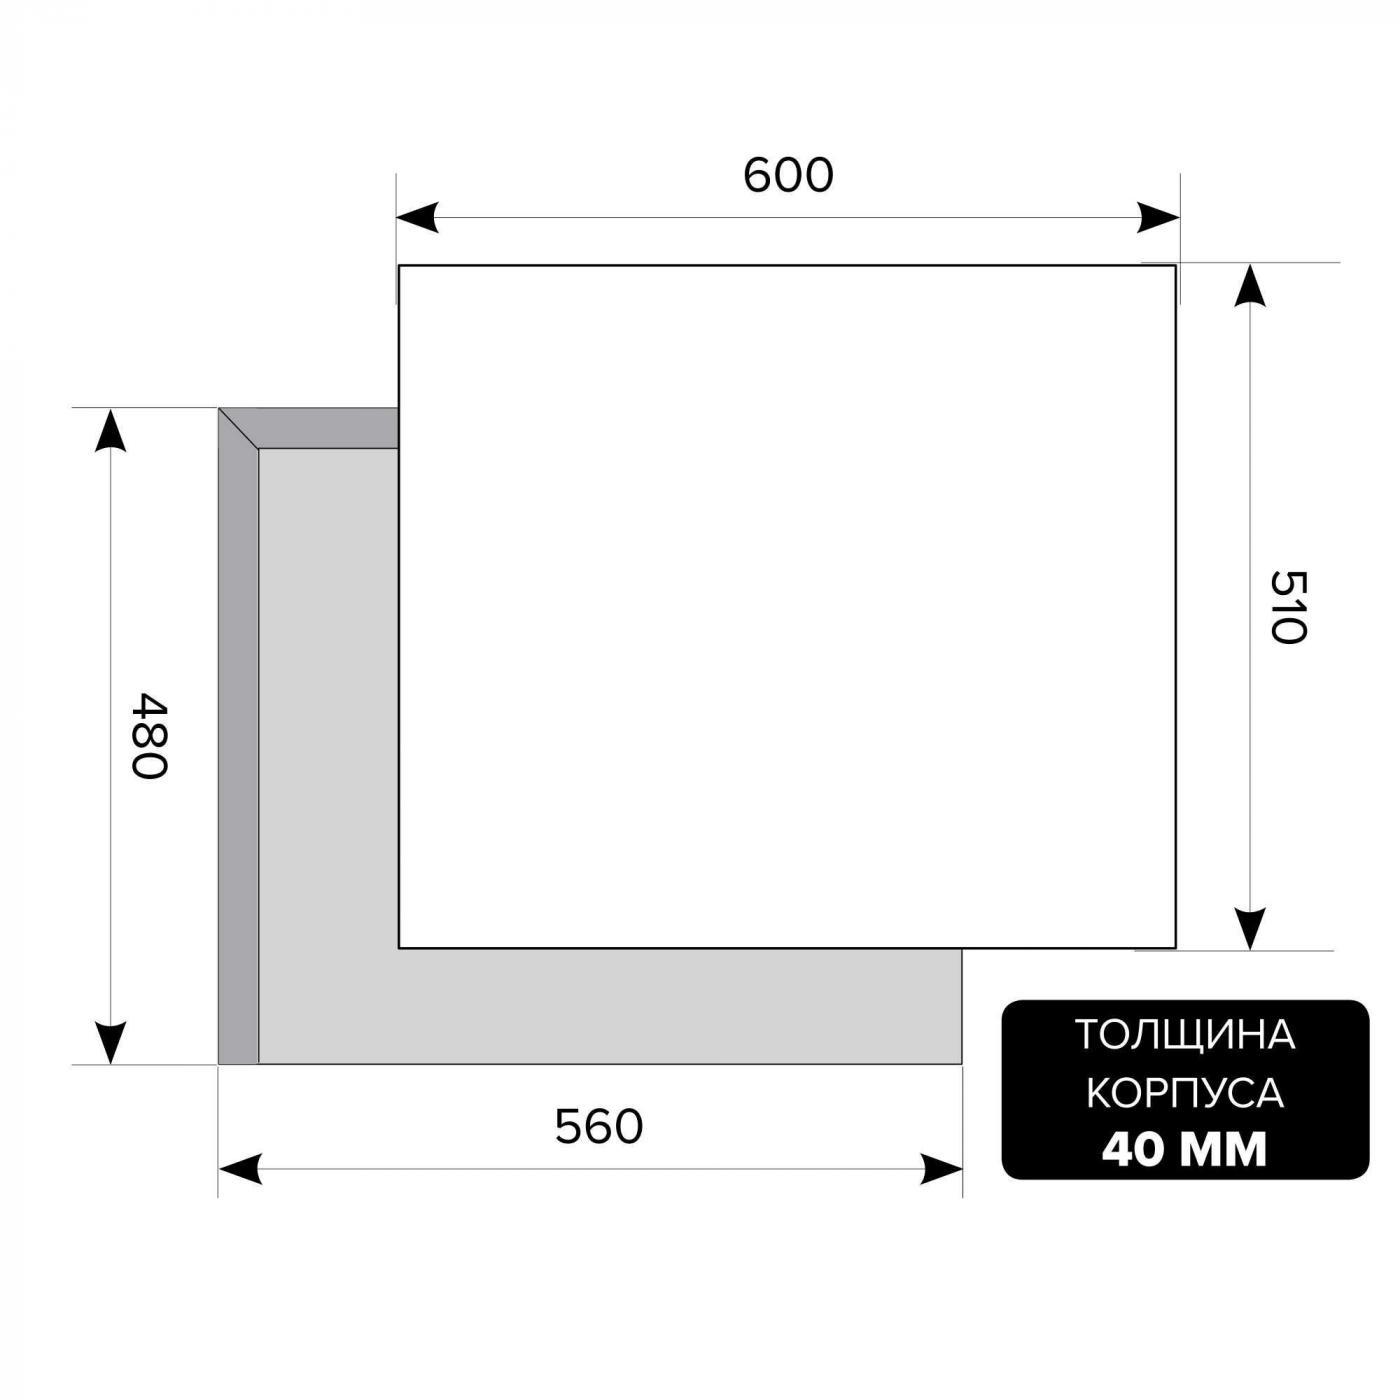 LEX GVG 640-1 BL